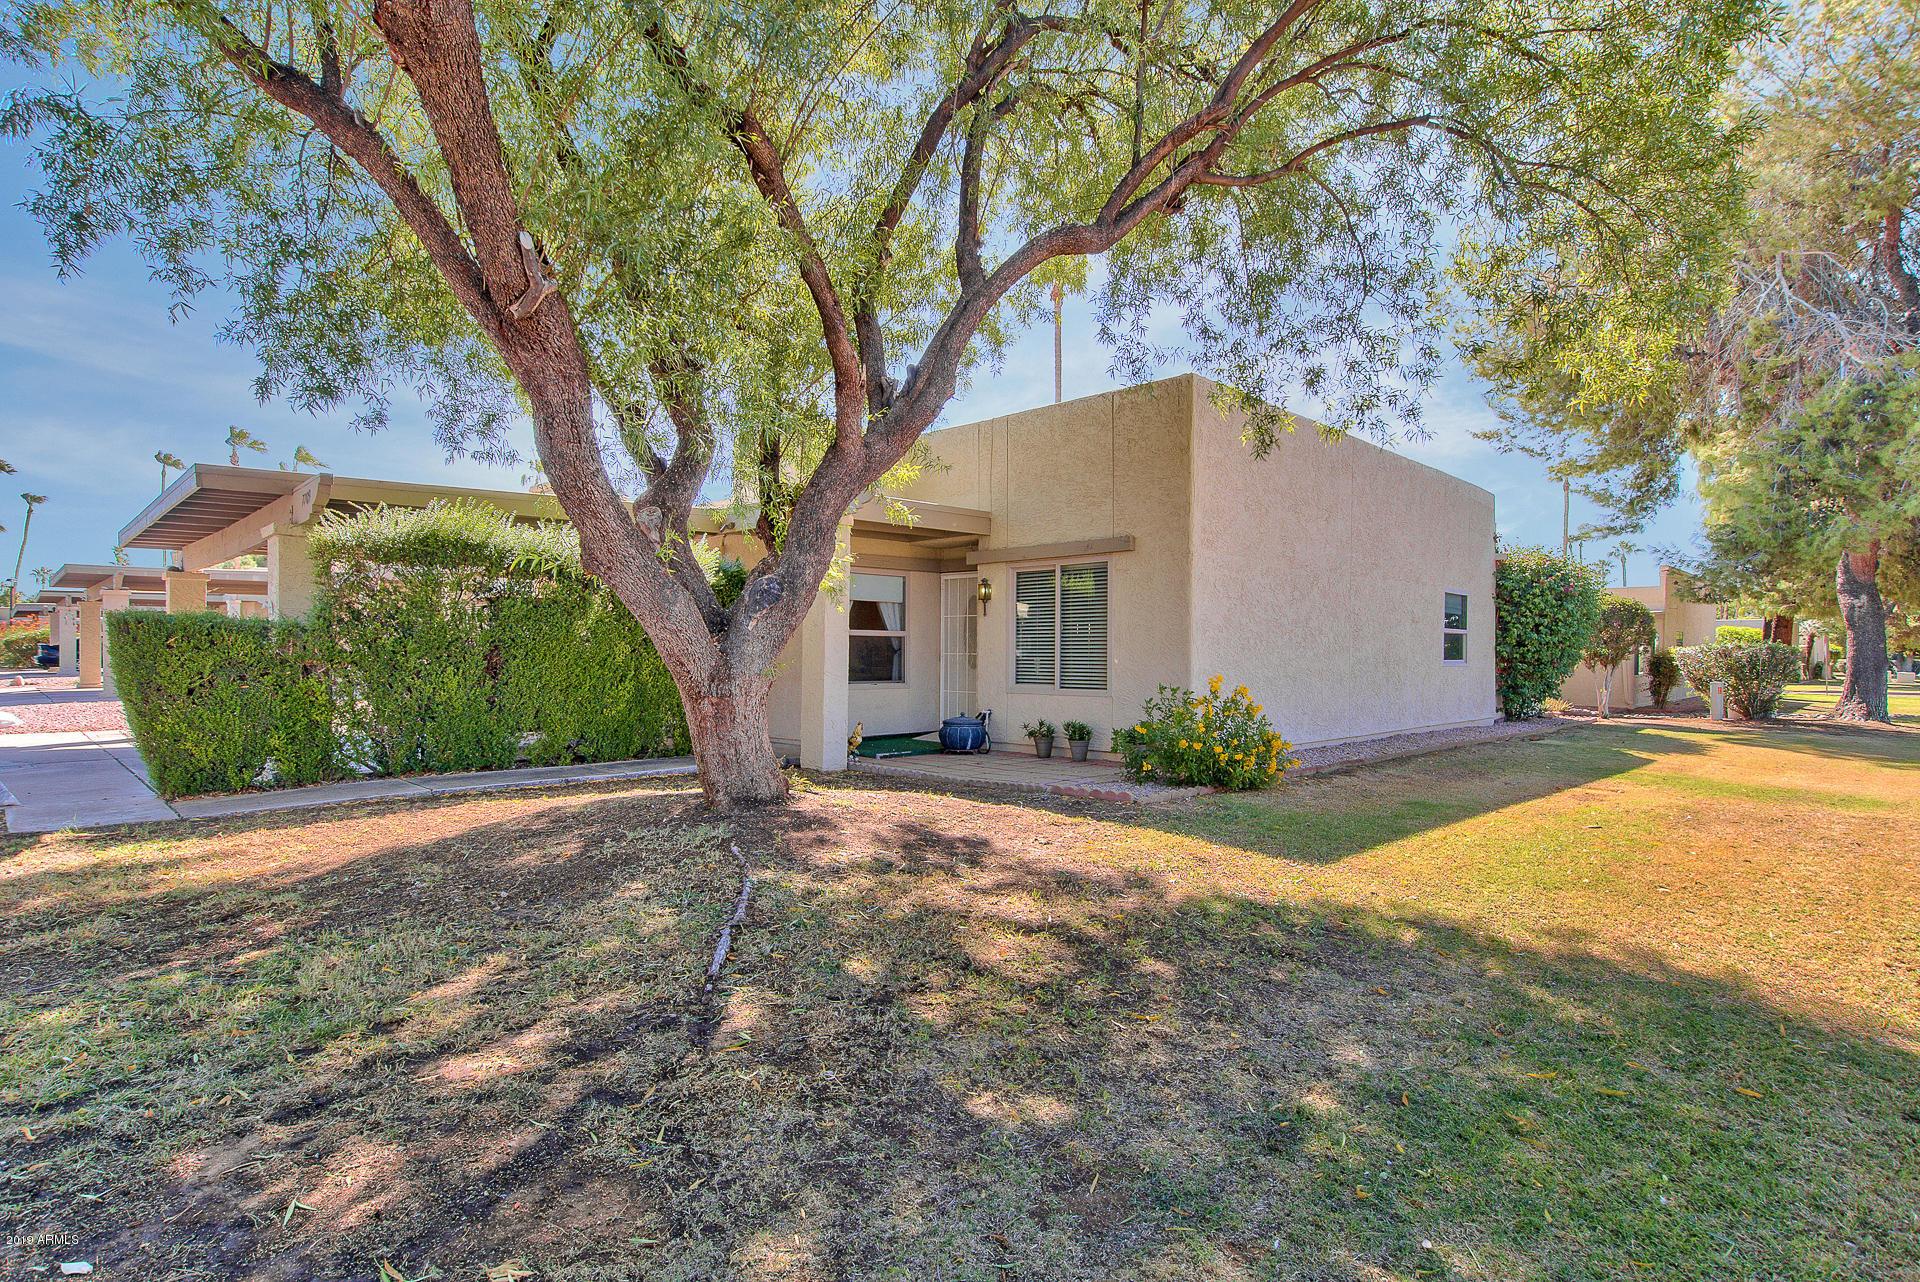 Photo of 7709 E MARIPOSA Way, Mesa, AZ 85208